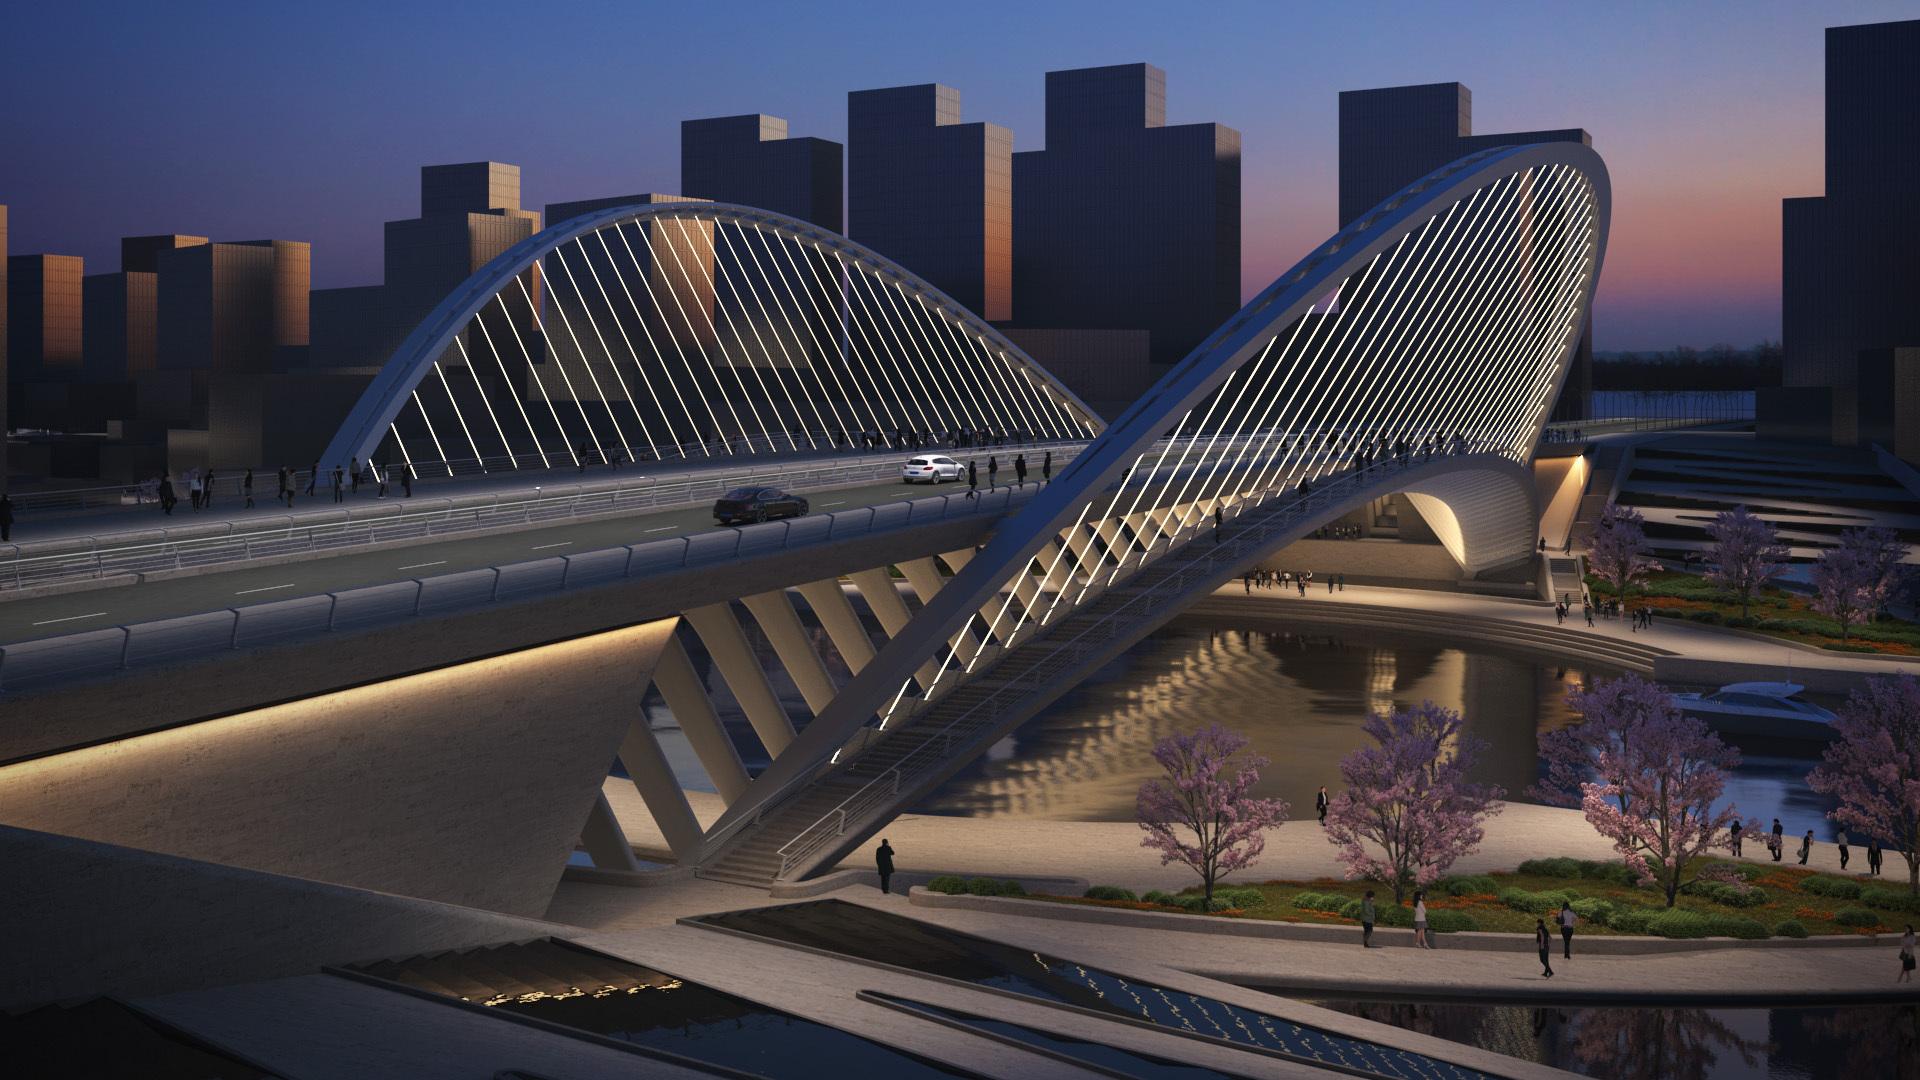 Gallery Of Santiago Calatrava Designs 3 New Bridges For